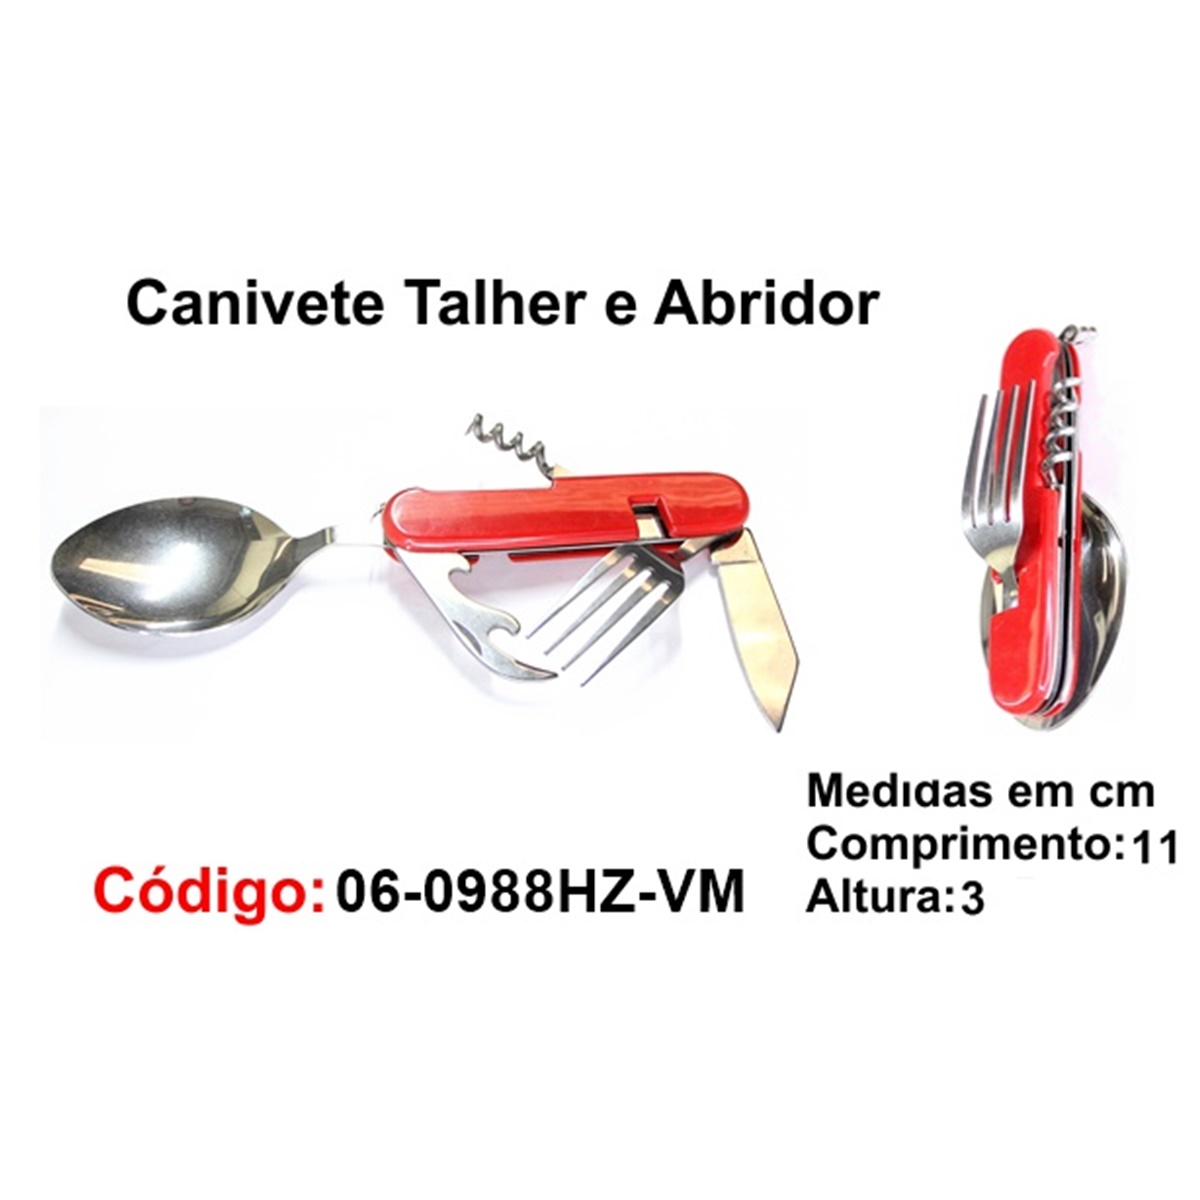 Canivete Talher Abridor Multiuso Caça Pesca Etc. 06-0988HZ-VM